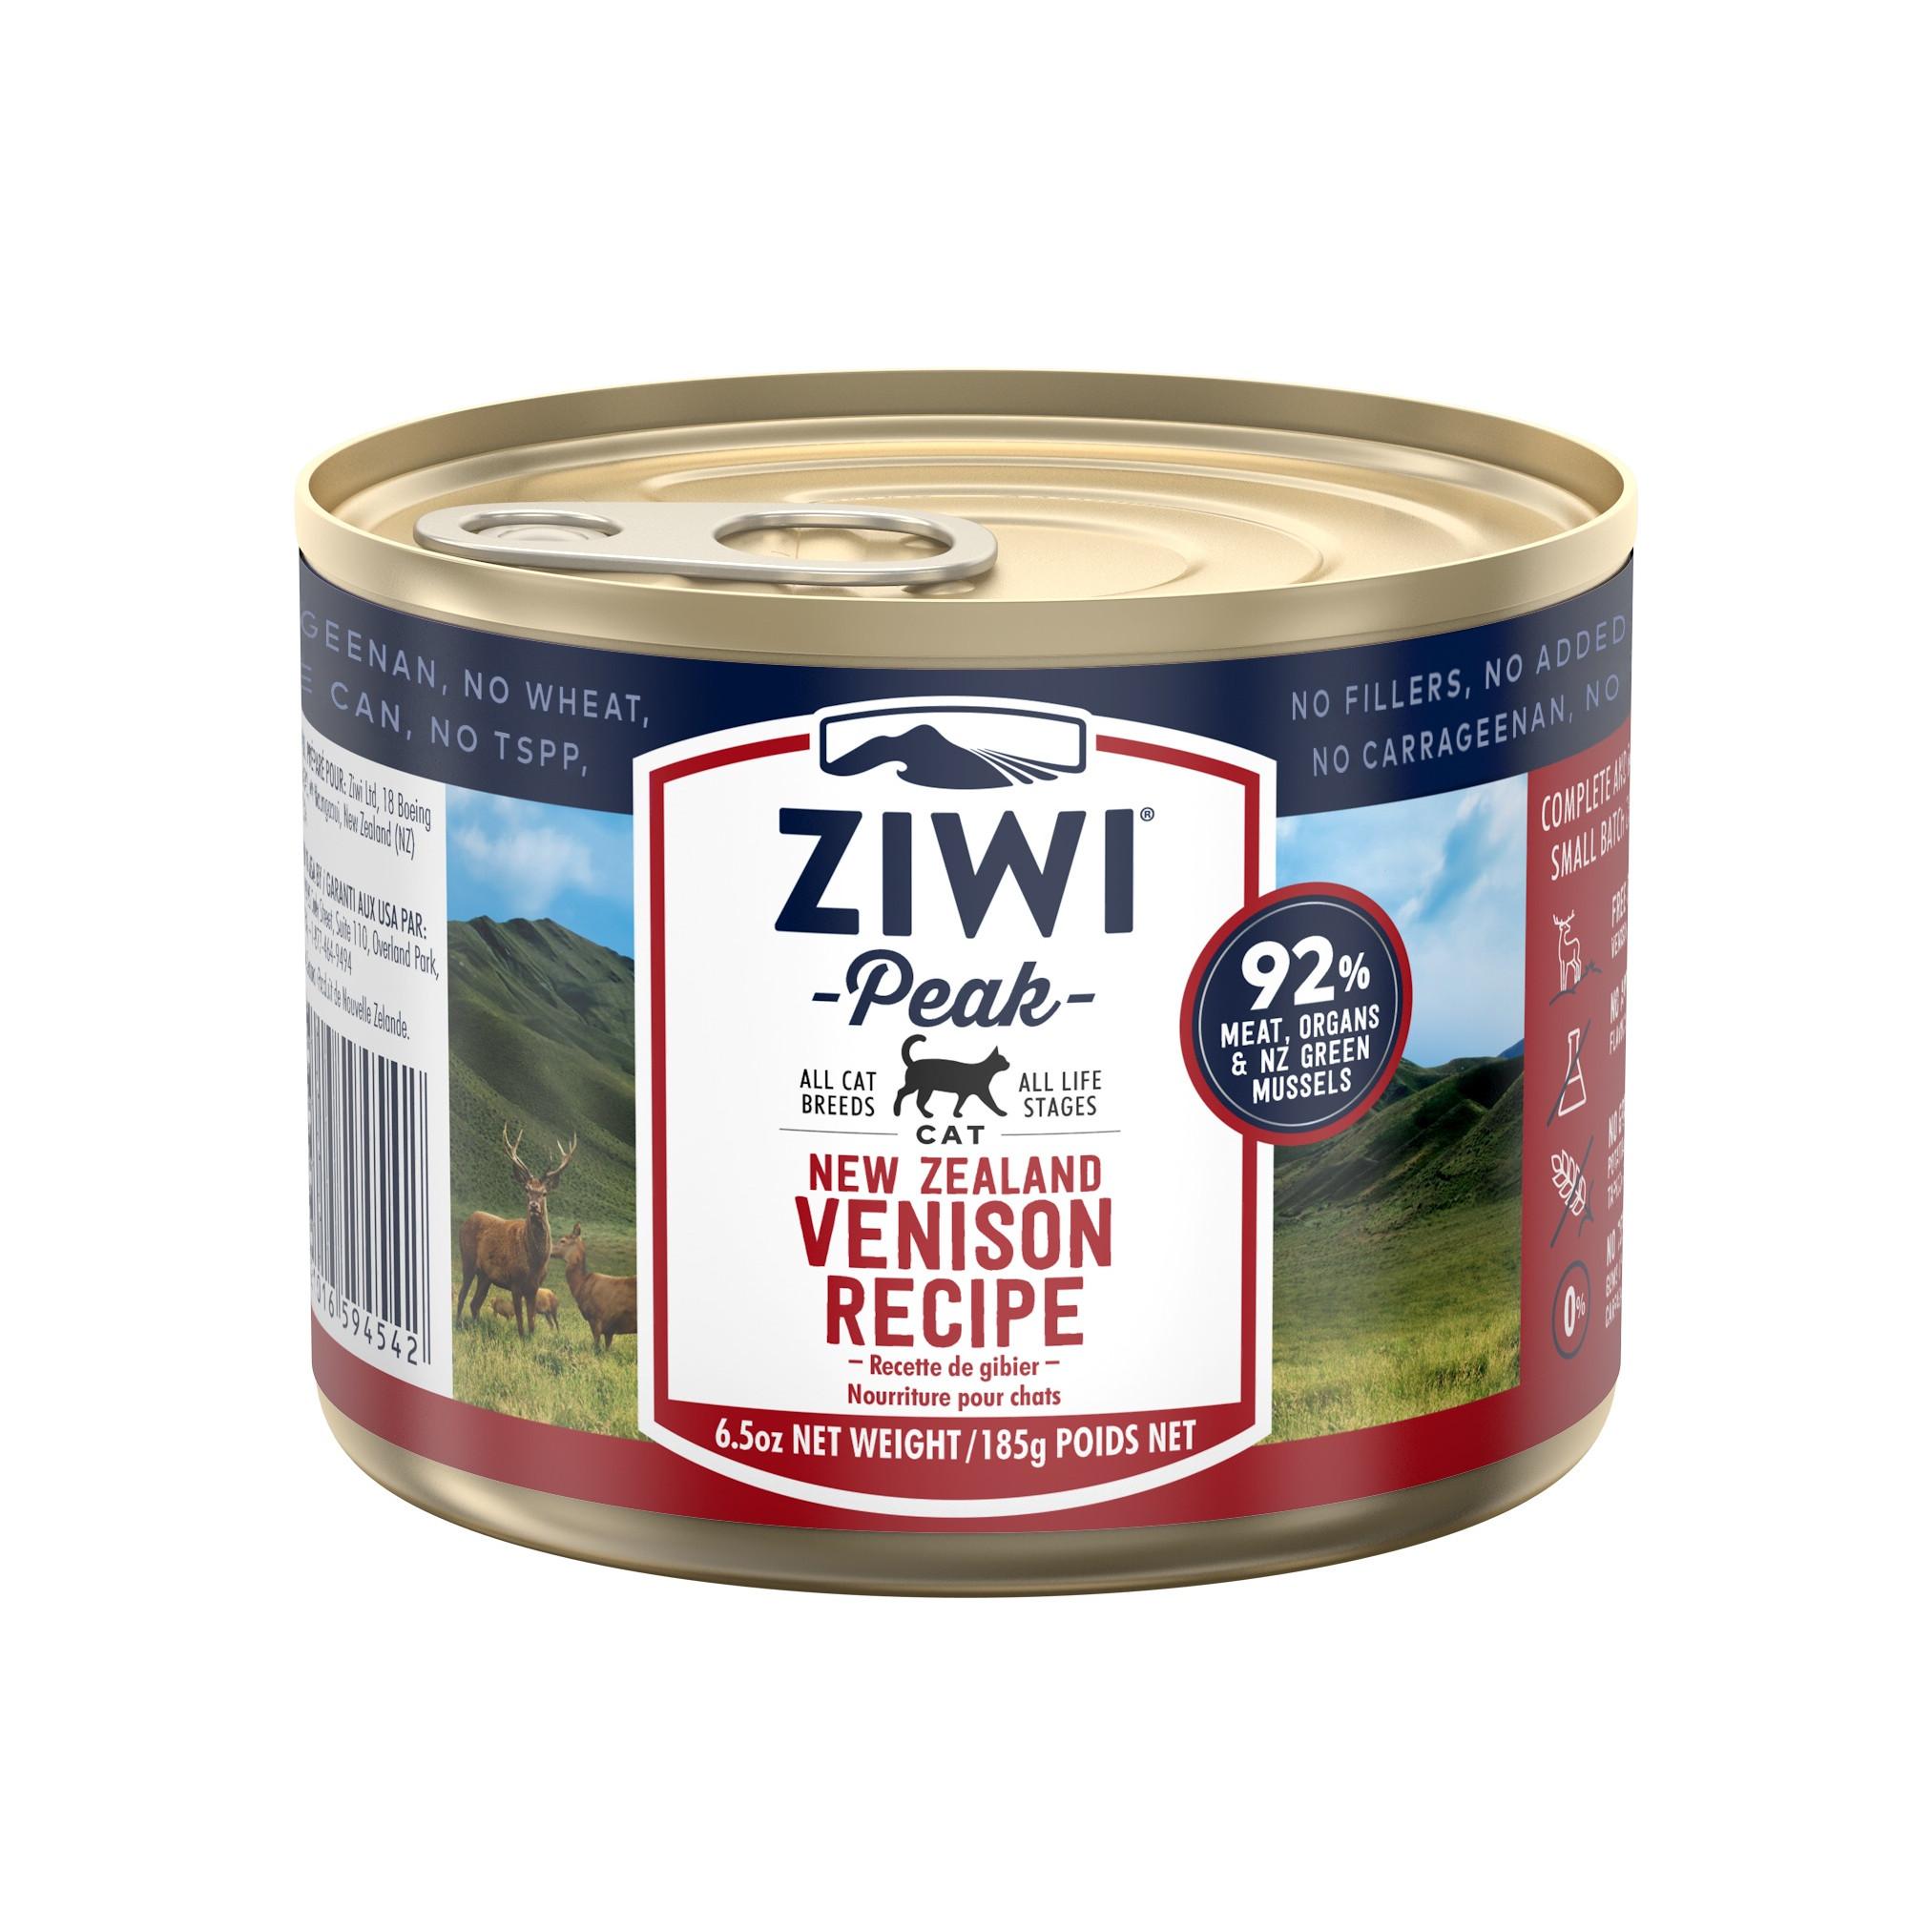 ZIWI Peak Canned Cat Food Venison Recipe, 6.5-oz 185-g